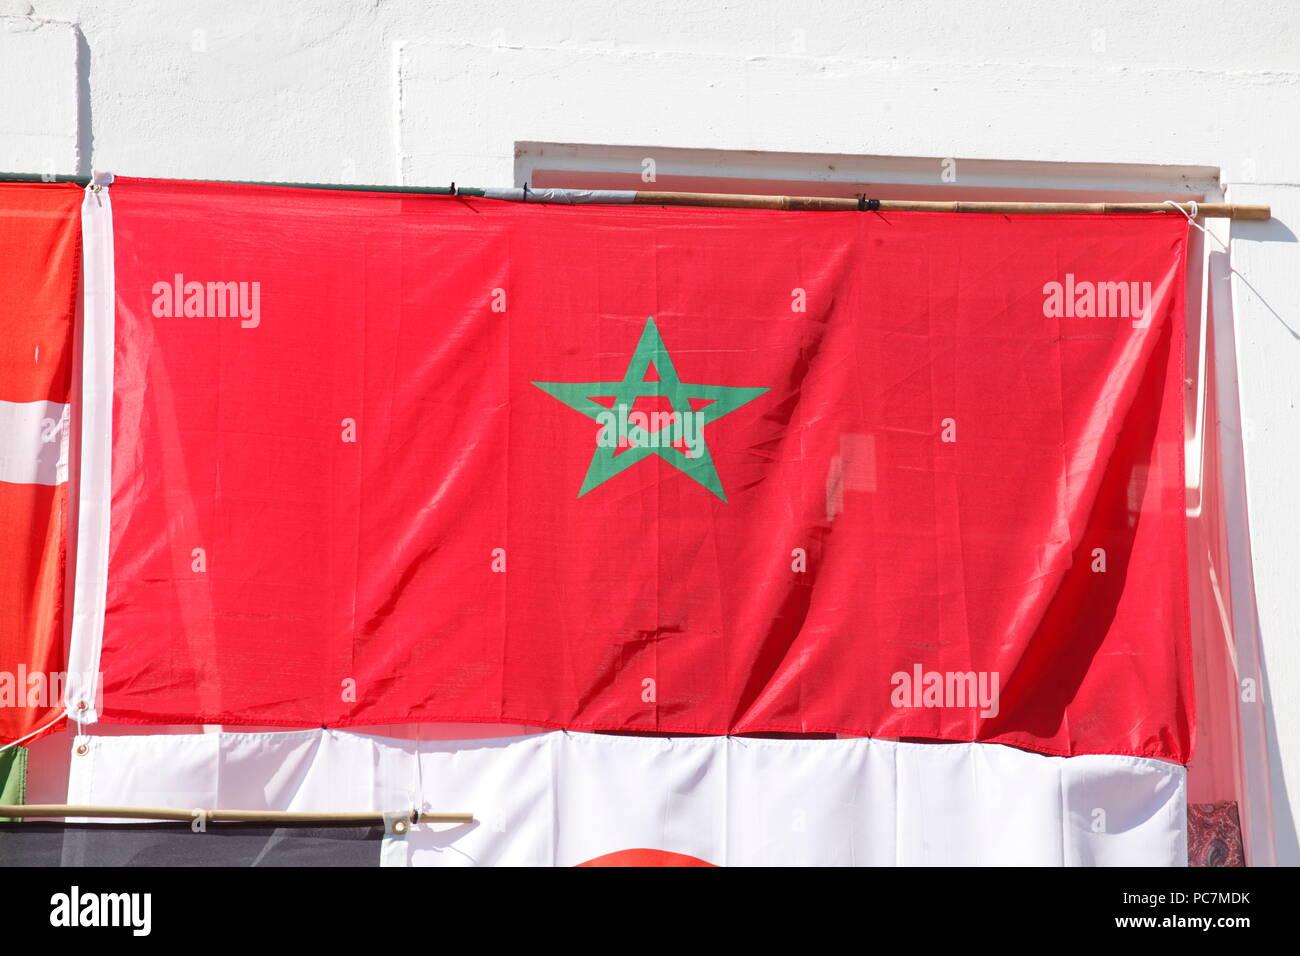 Moroccan national flag hung on a house wall, old town, Saarbruecken, Germany, Europe   I Marokkanische Nationalflagge an einer Hauswand aufgehängt, Al Stock Photo